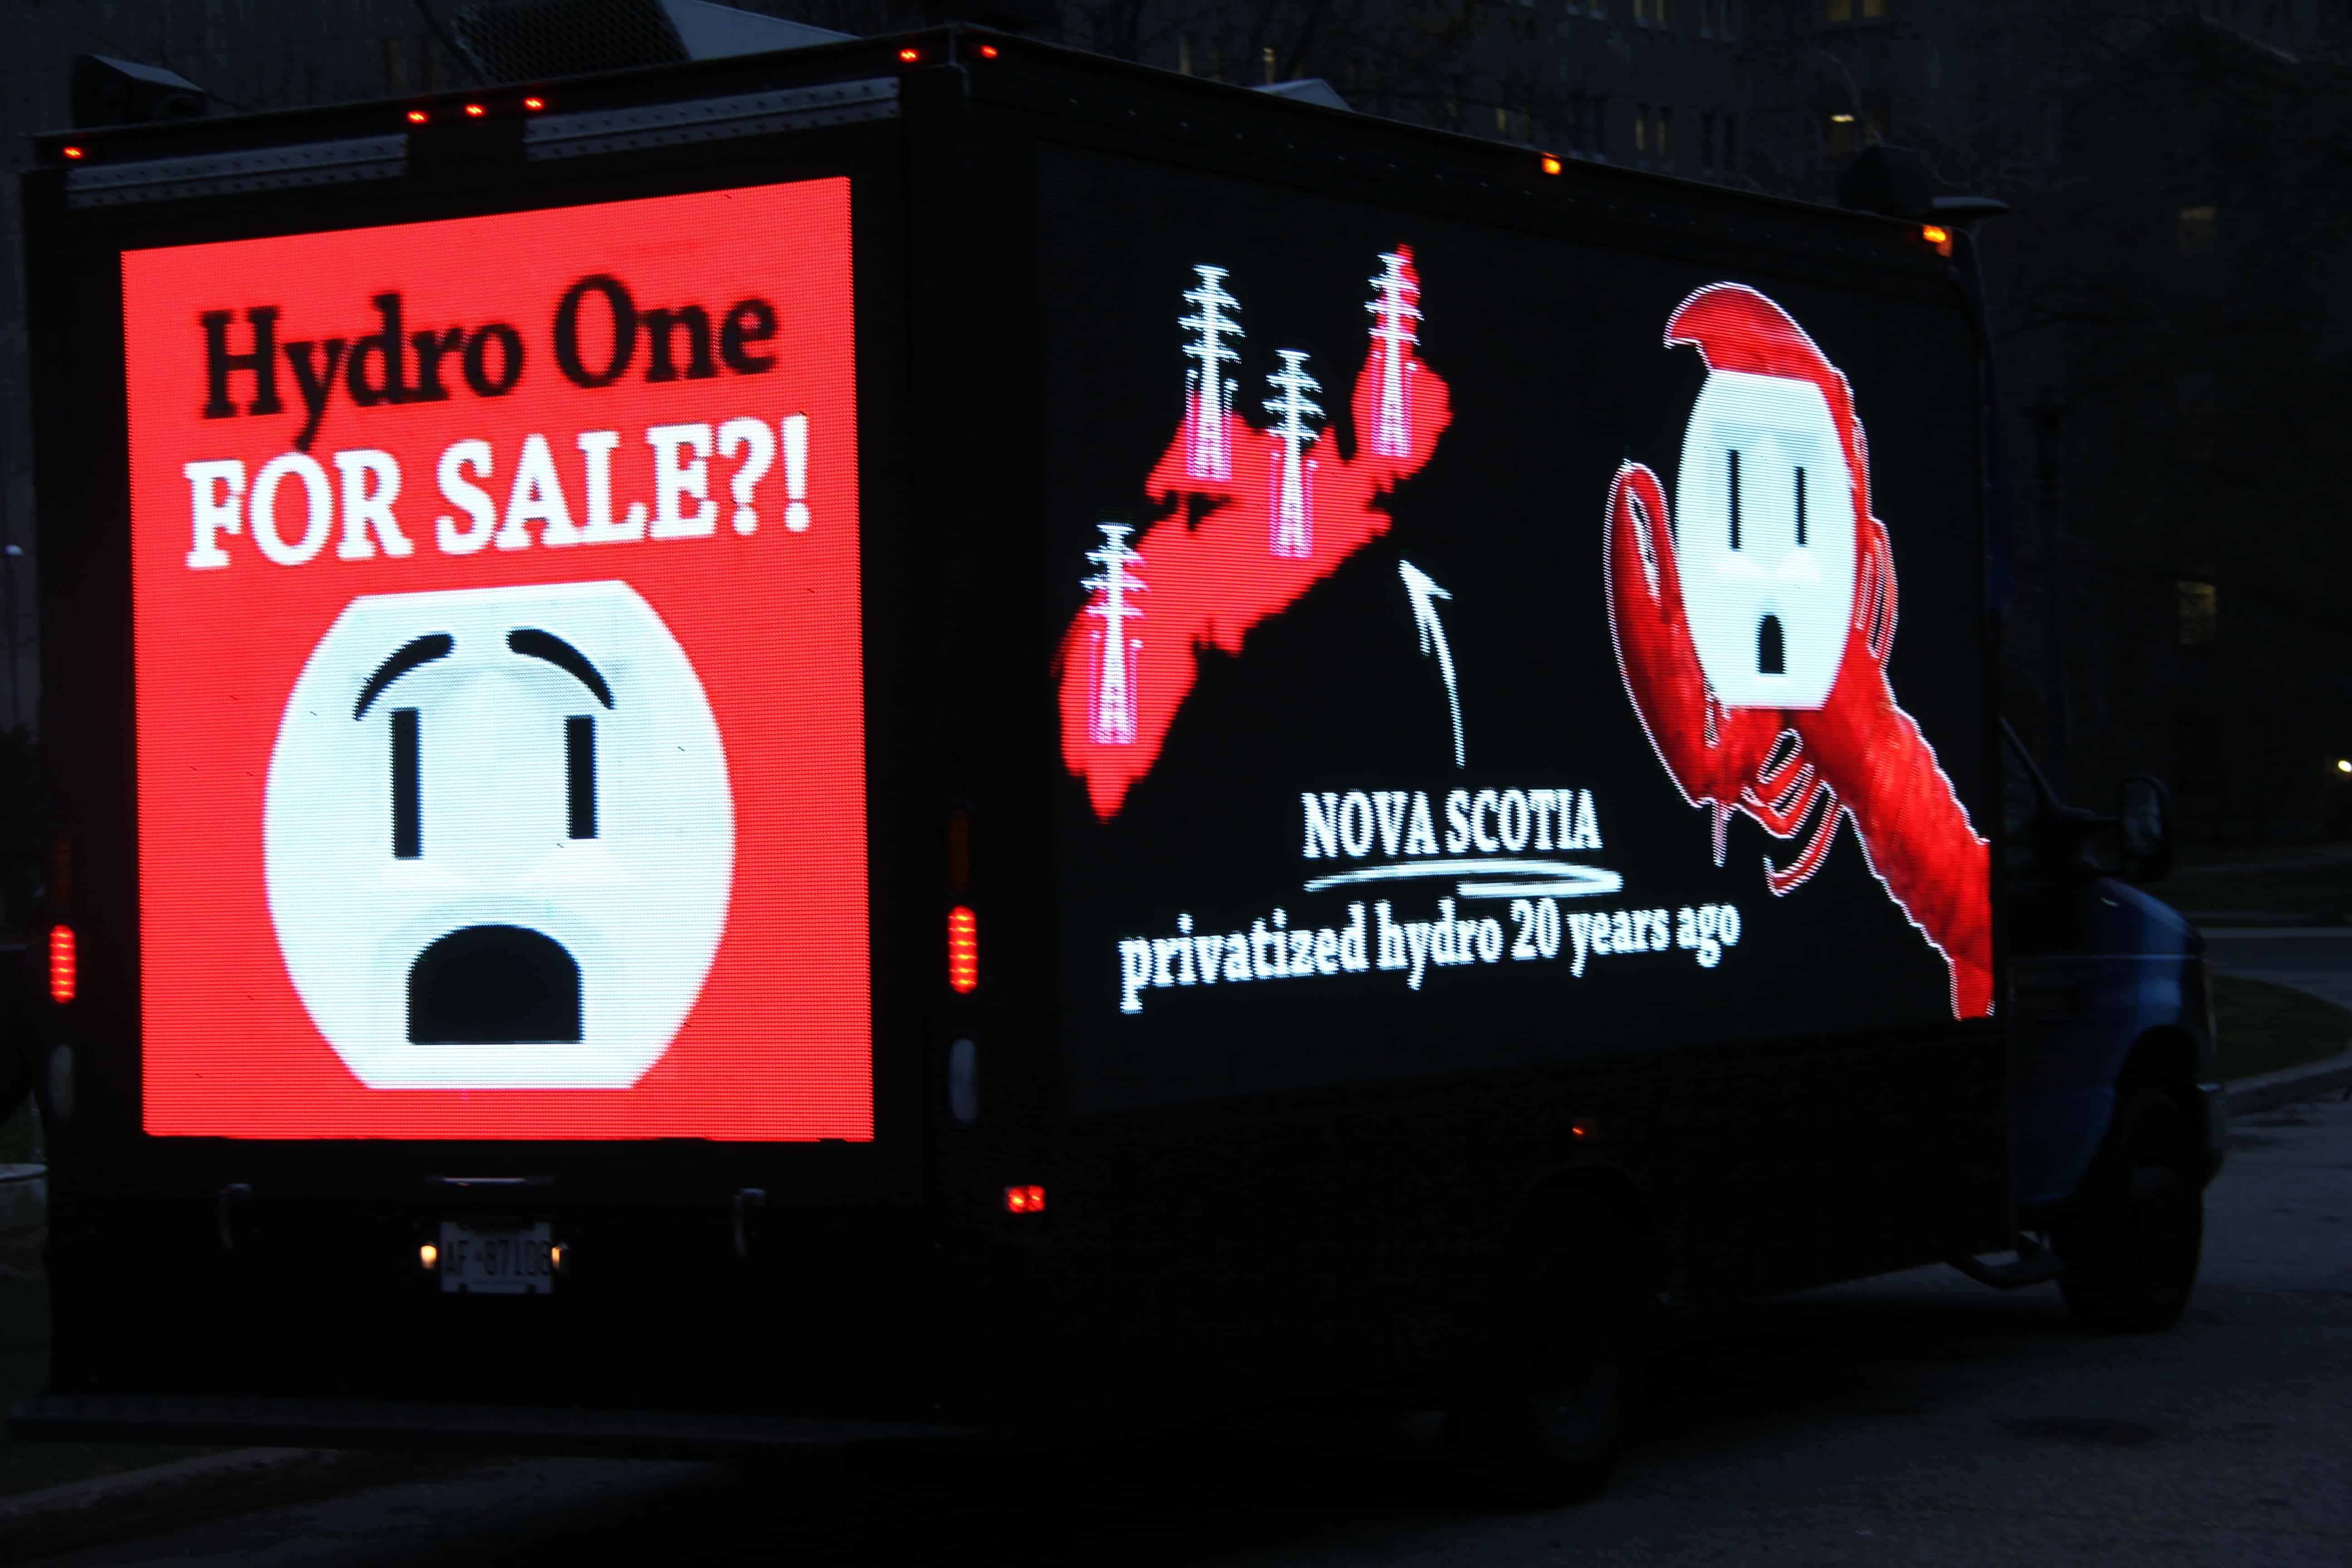 Digital Video Truck Ads company in Edmonton Canada